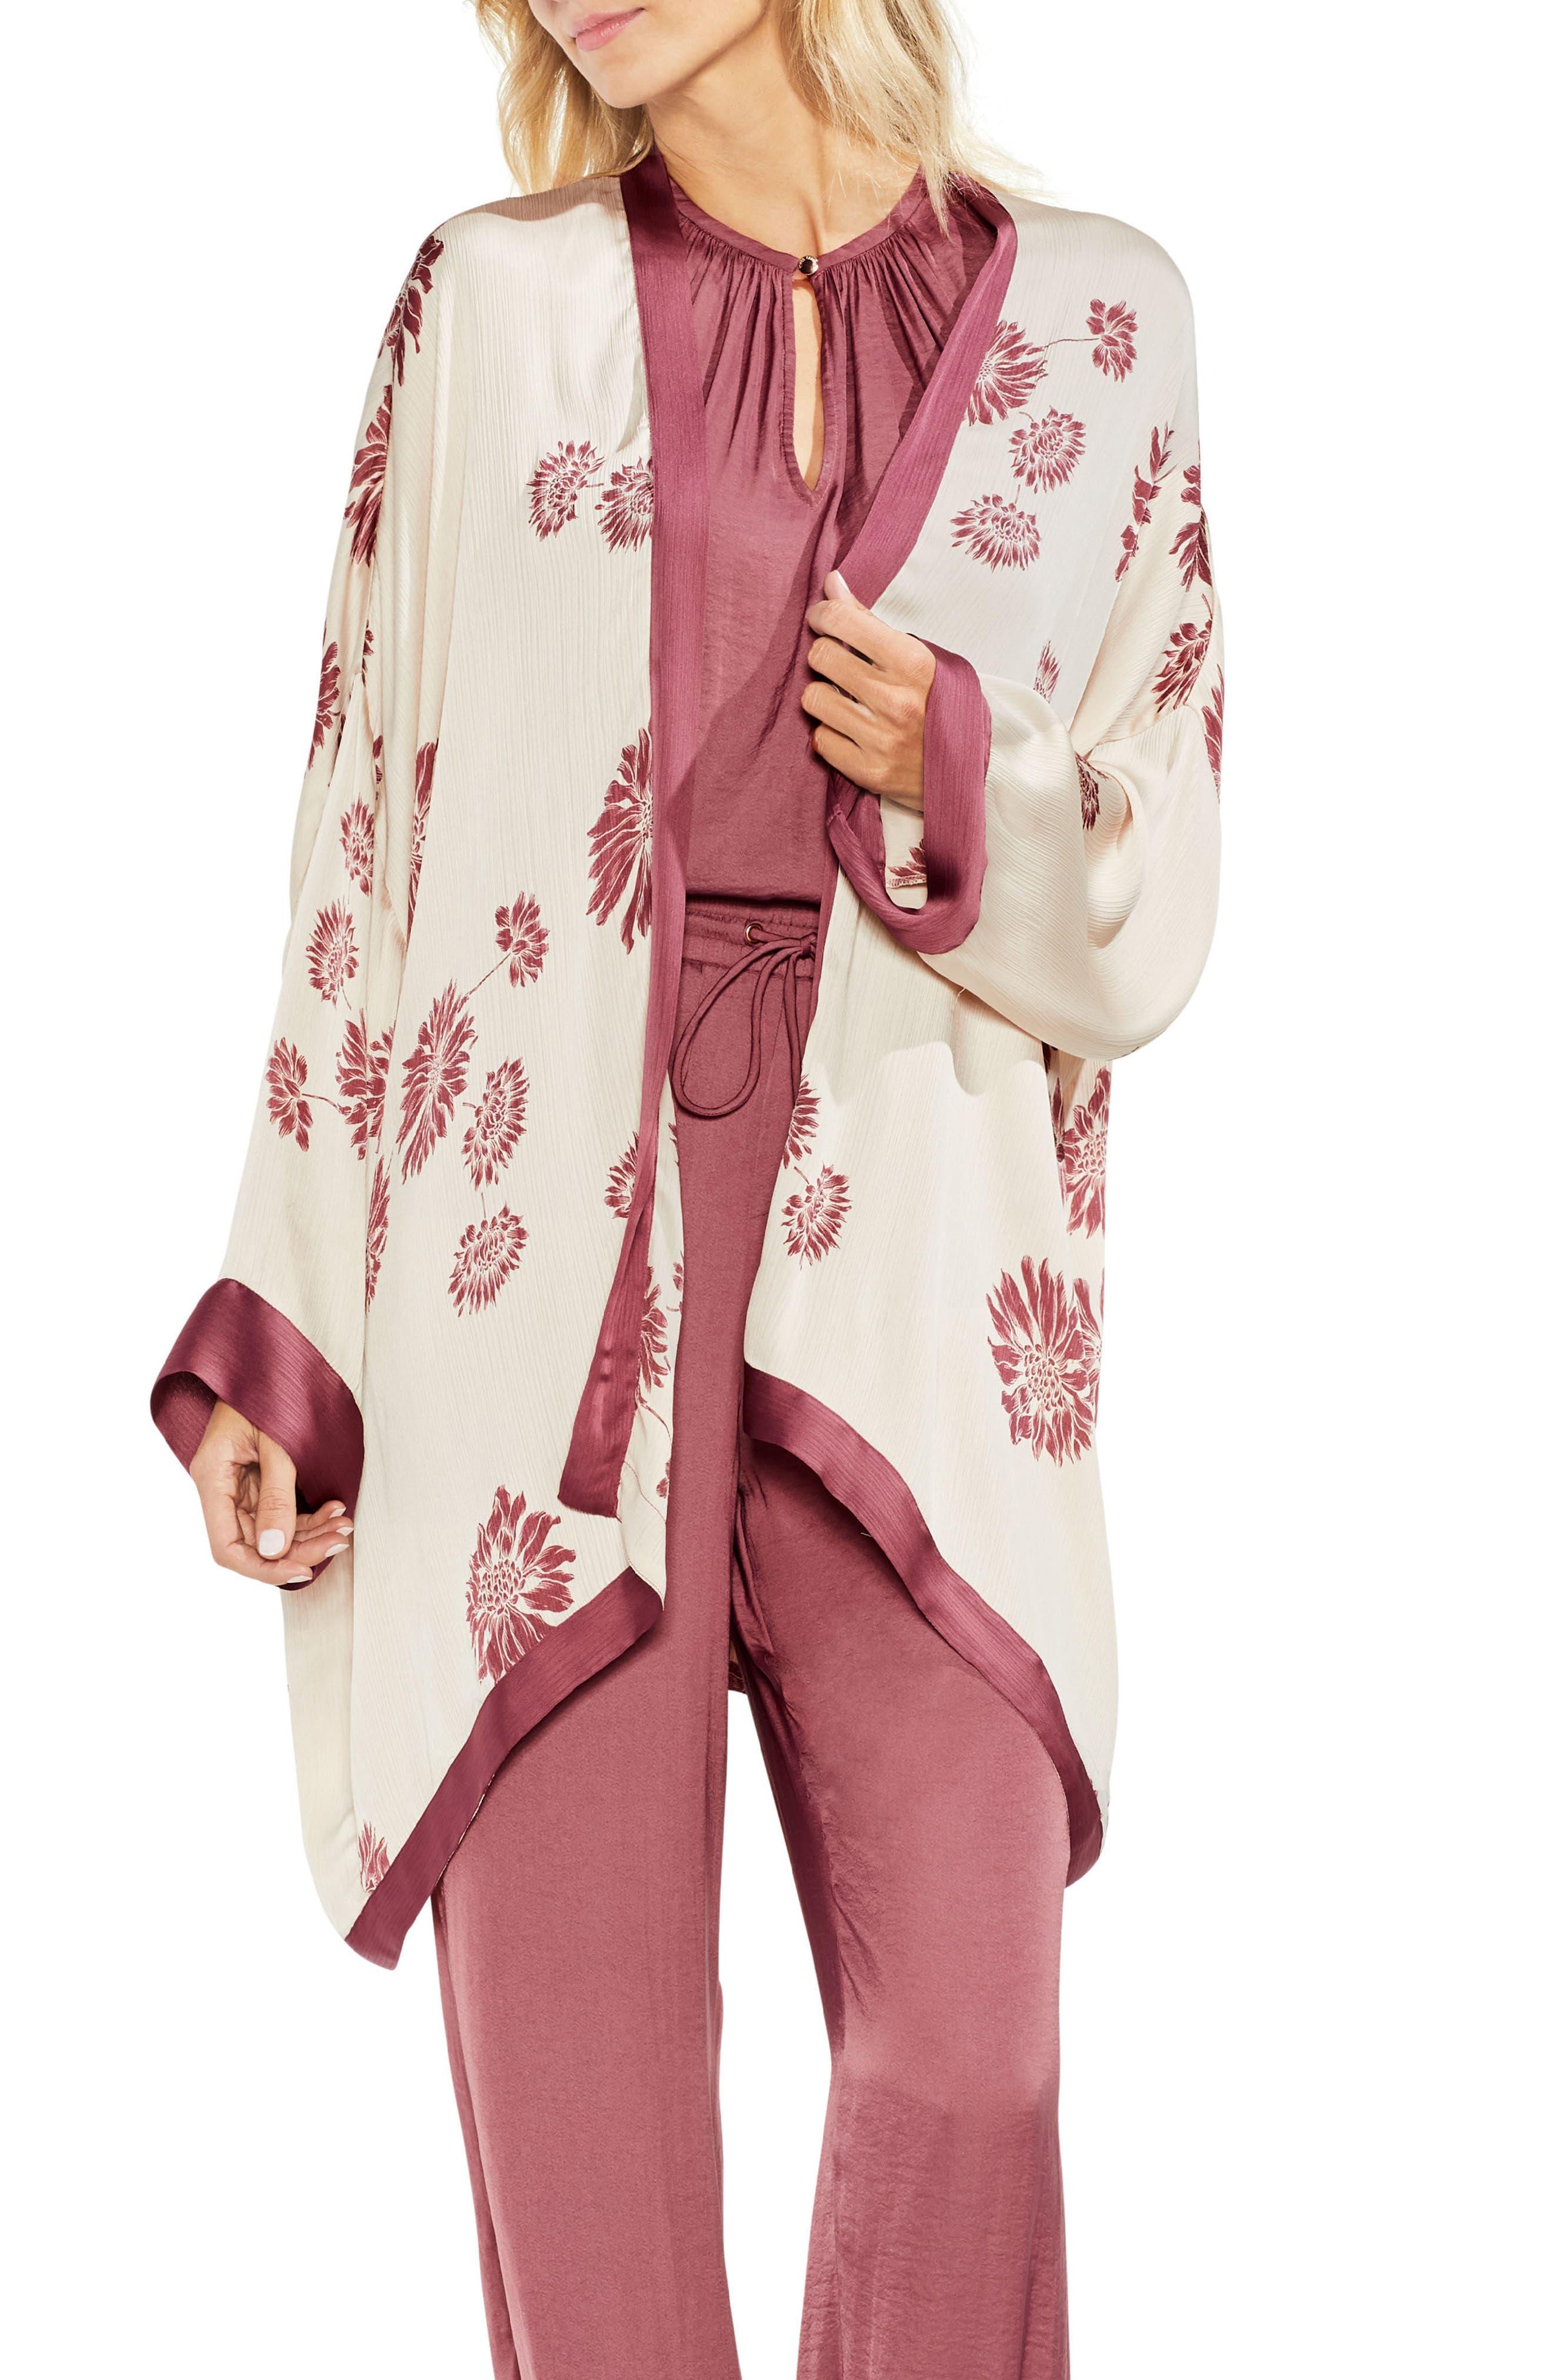 Chateau Sketch Floral Kimono,                             Main thumbnail 1, color,                             Rich Cream